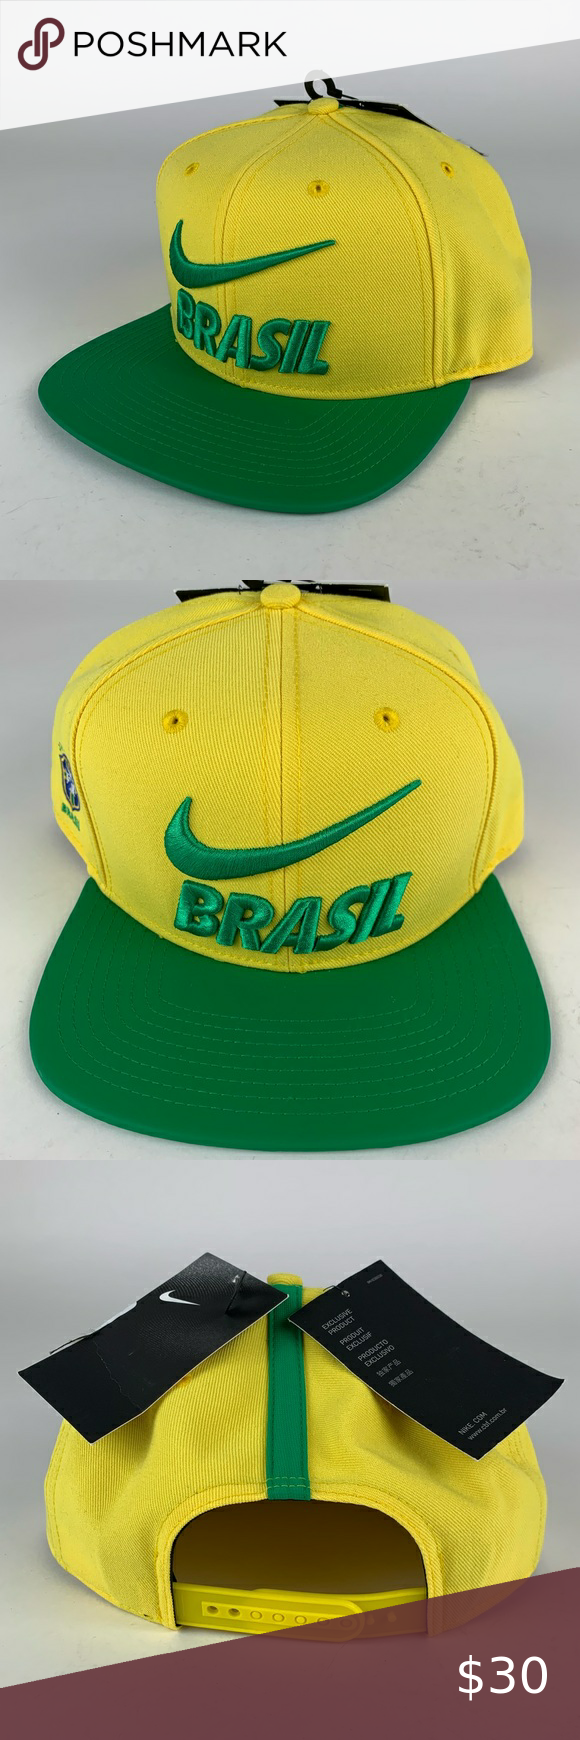 Brazil Fifa Nike Snapback Hat Snapback Hats Nike Hat Hats For Sale